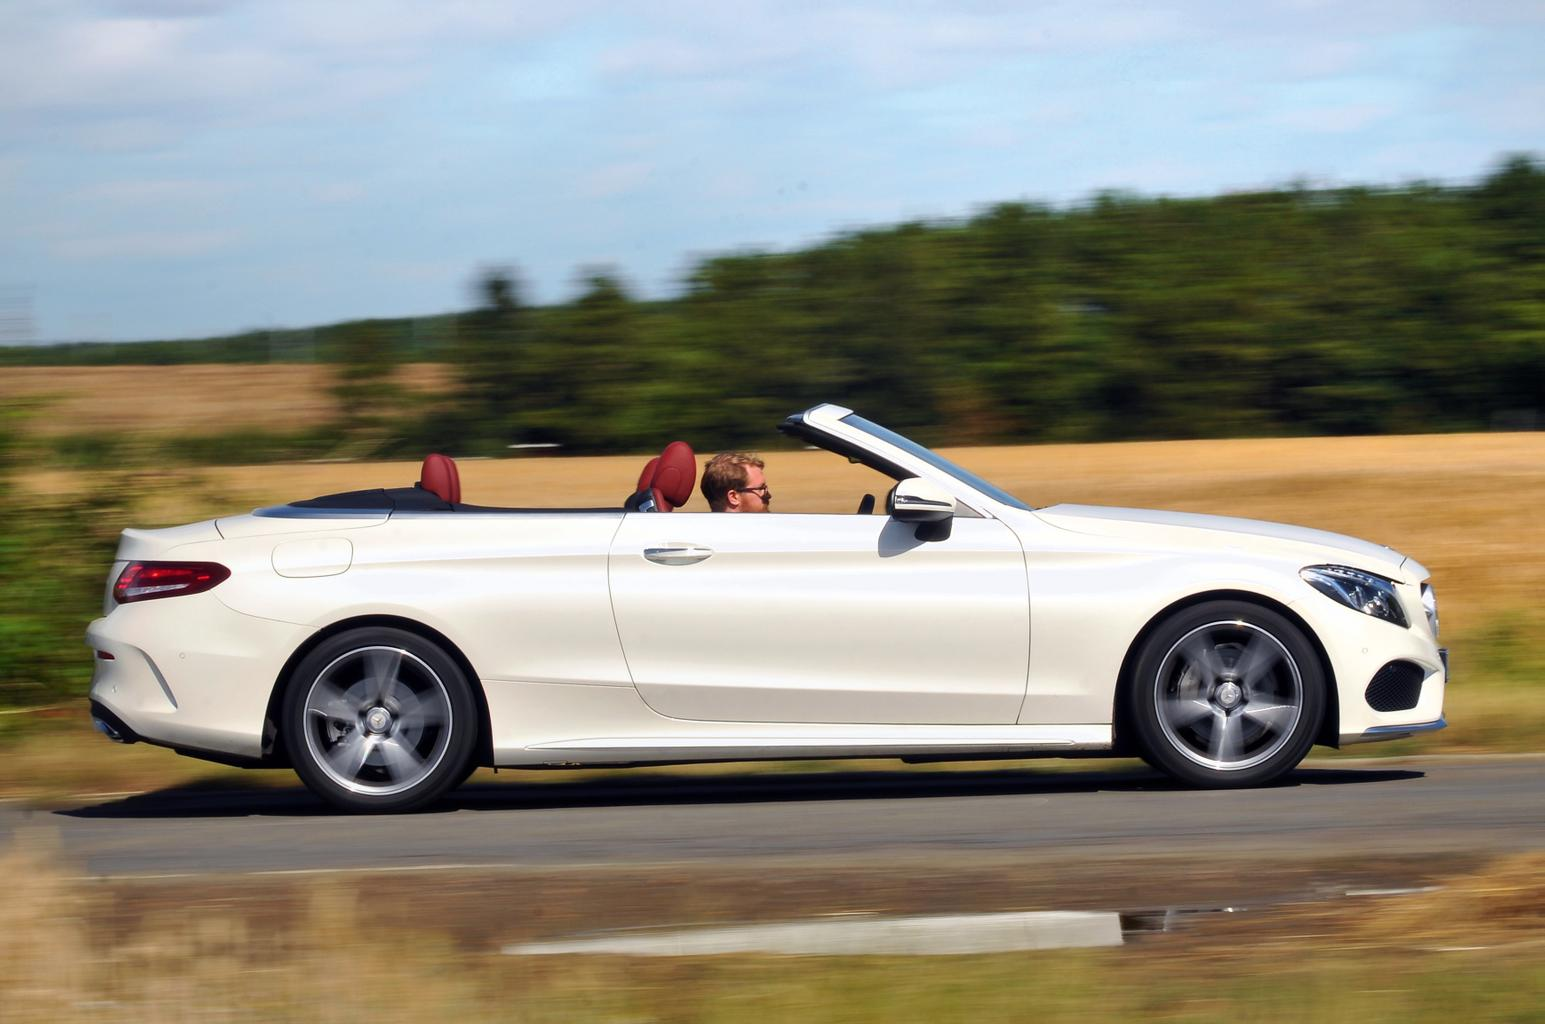 New Range Rover Evoque Convertible vs Mercedes C-Class Cabriolet